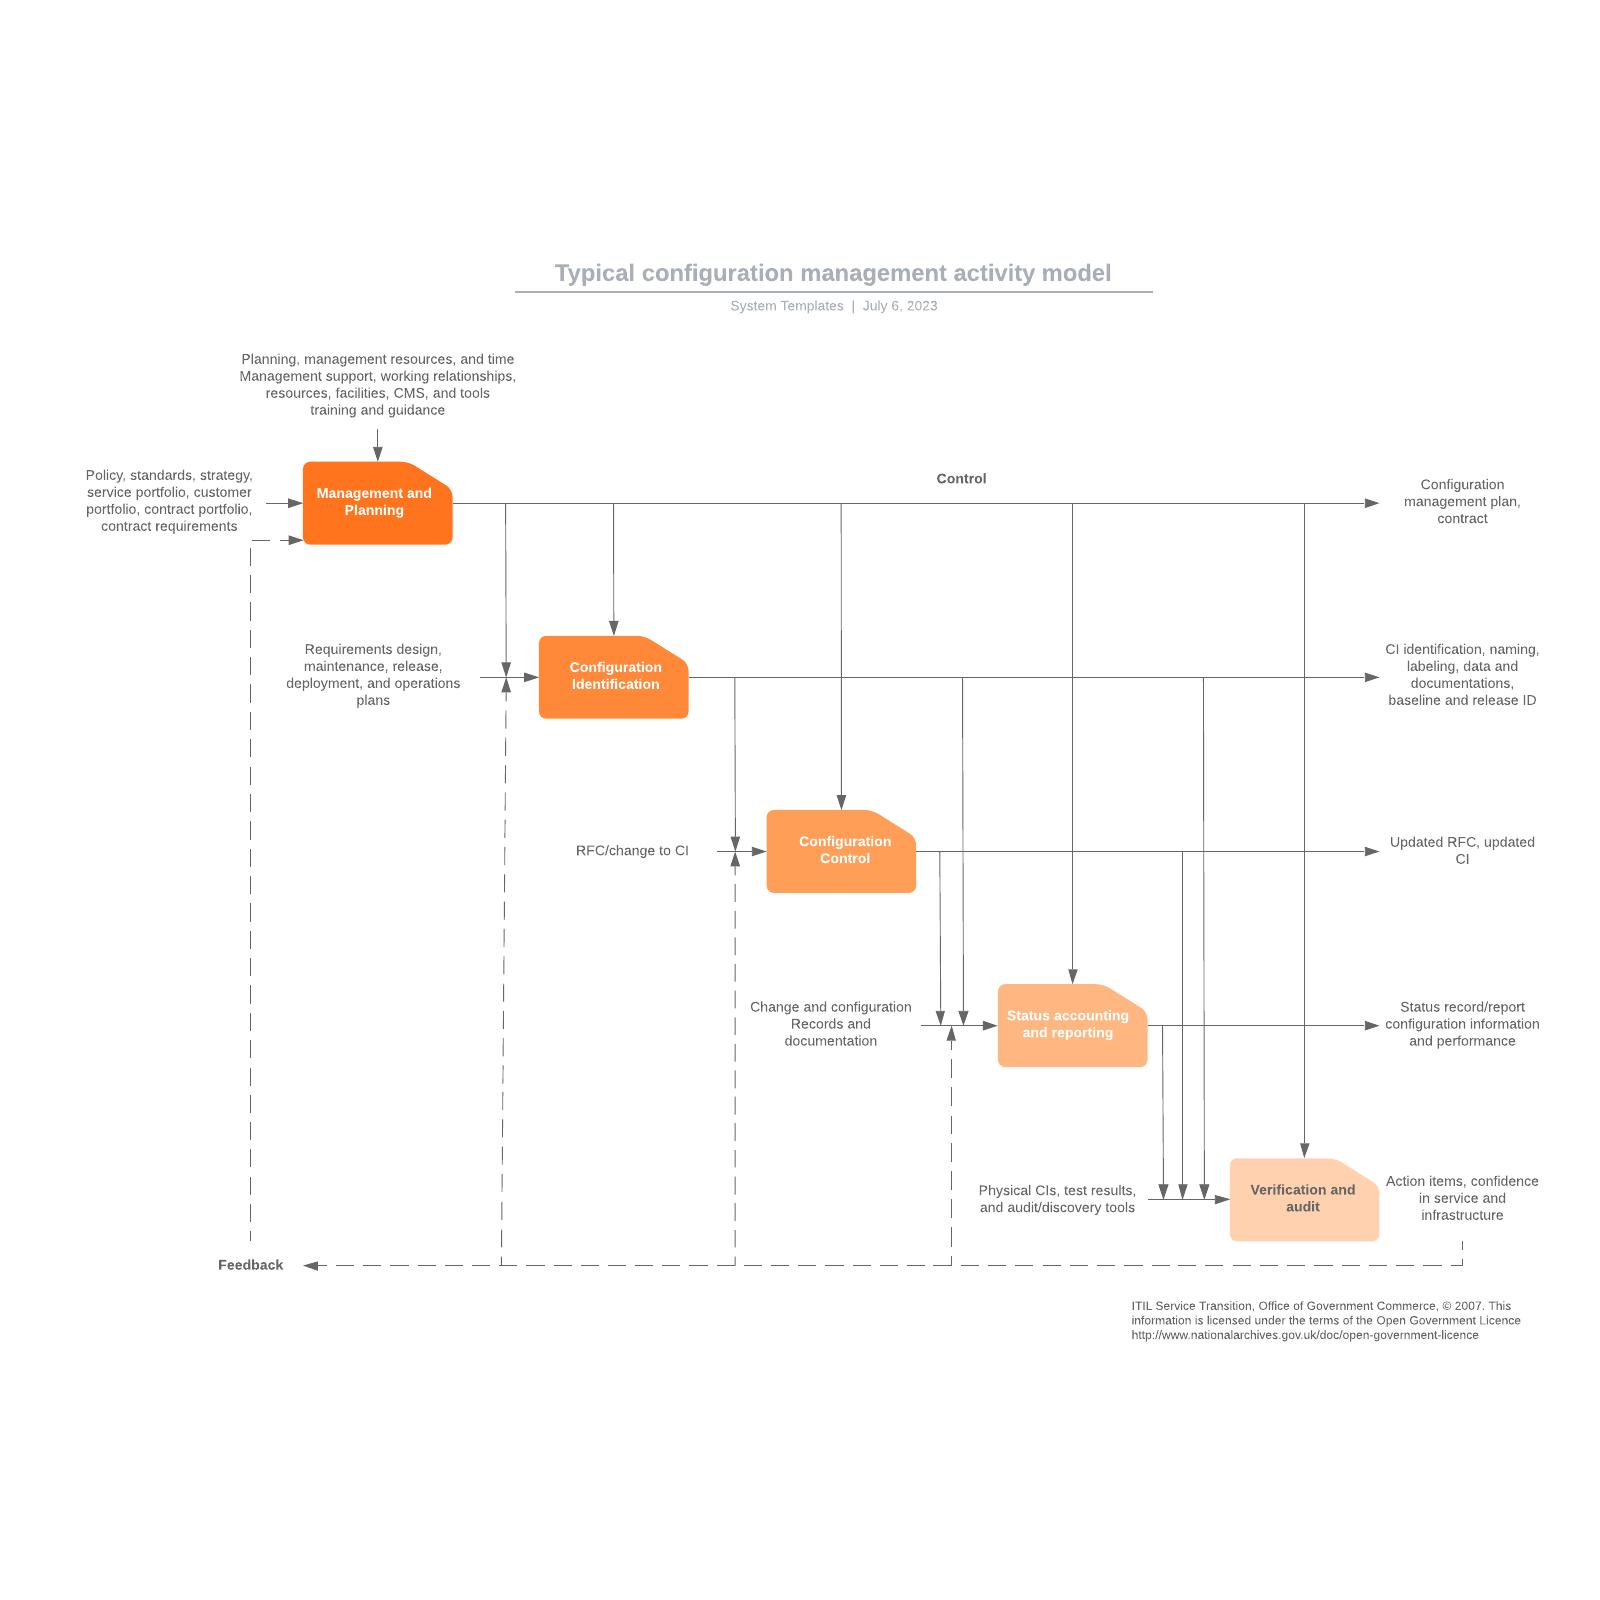 Typical configuration management activity model